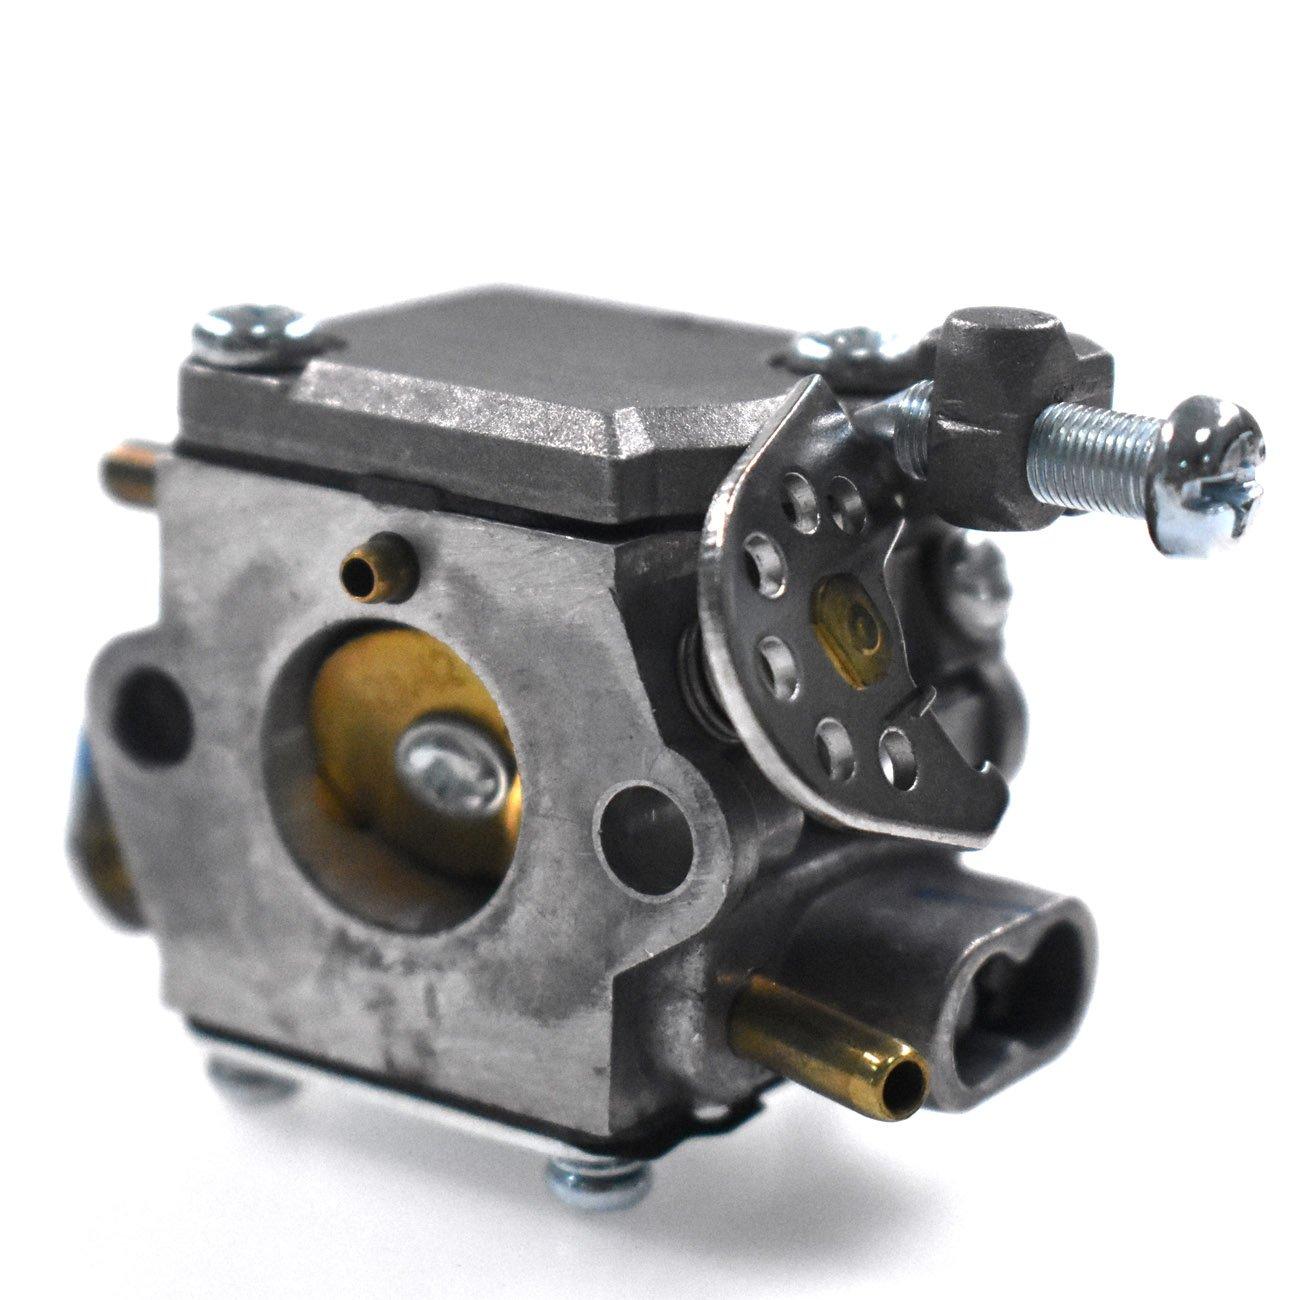 Ruichang Carburetor For Chainsaw 309362001 309362003 Homelite 35cc 38cc 42cc